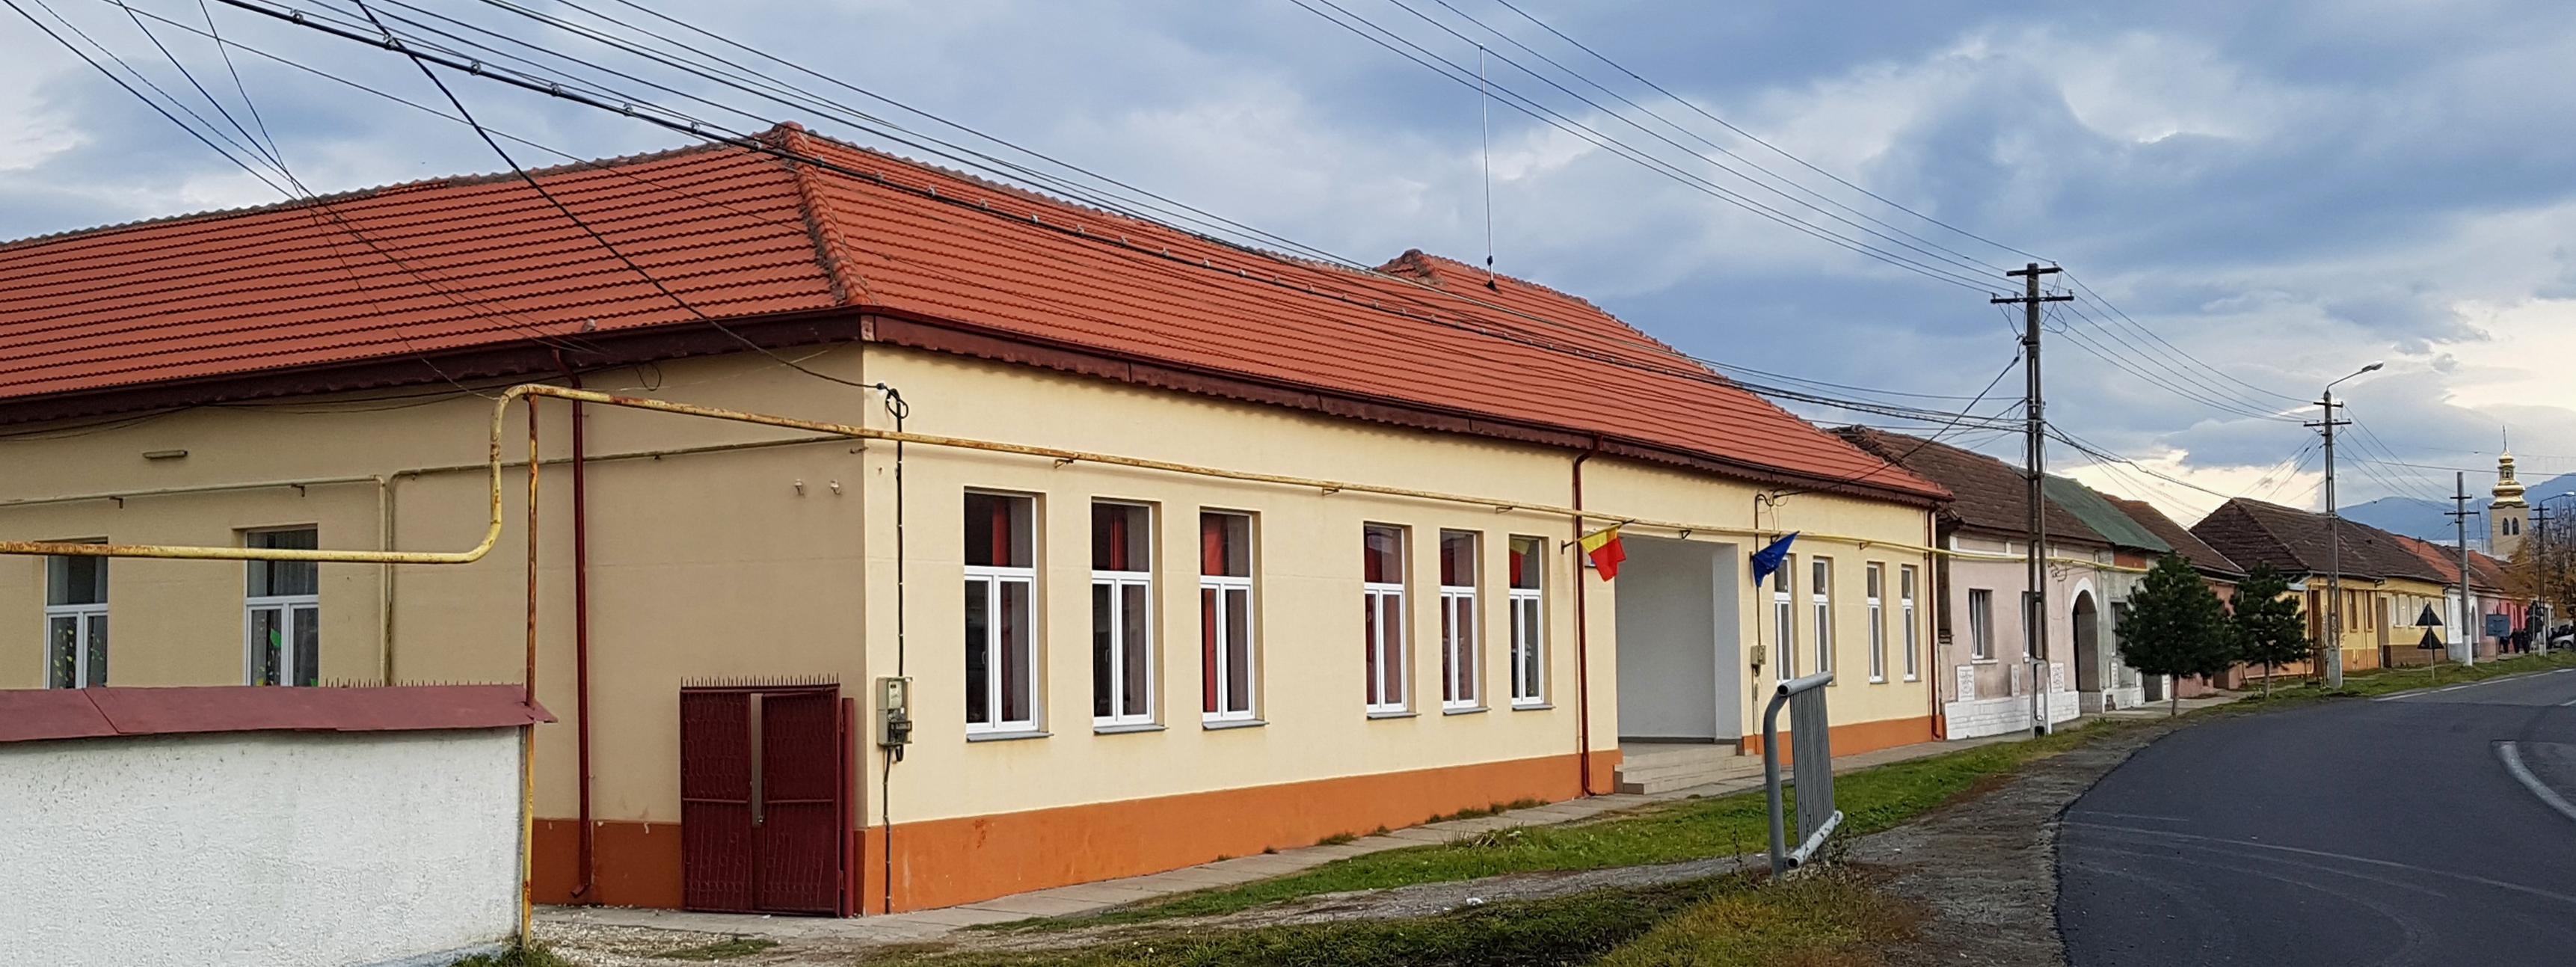 Școala Gimnazială Zăvoi